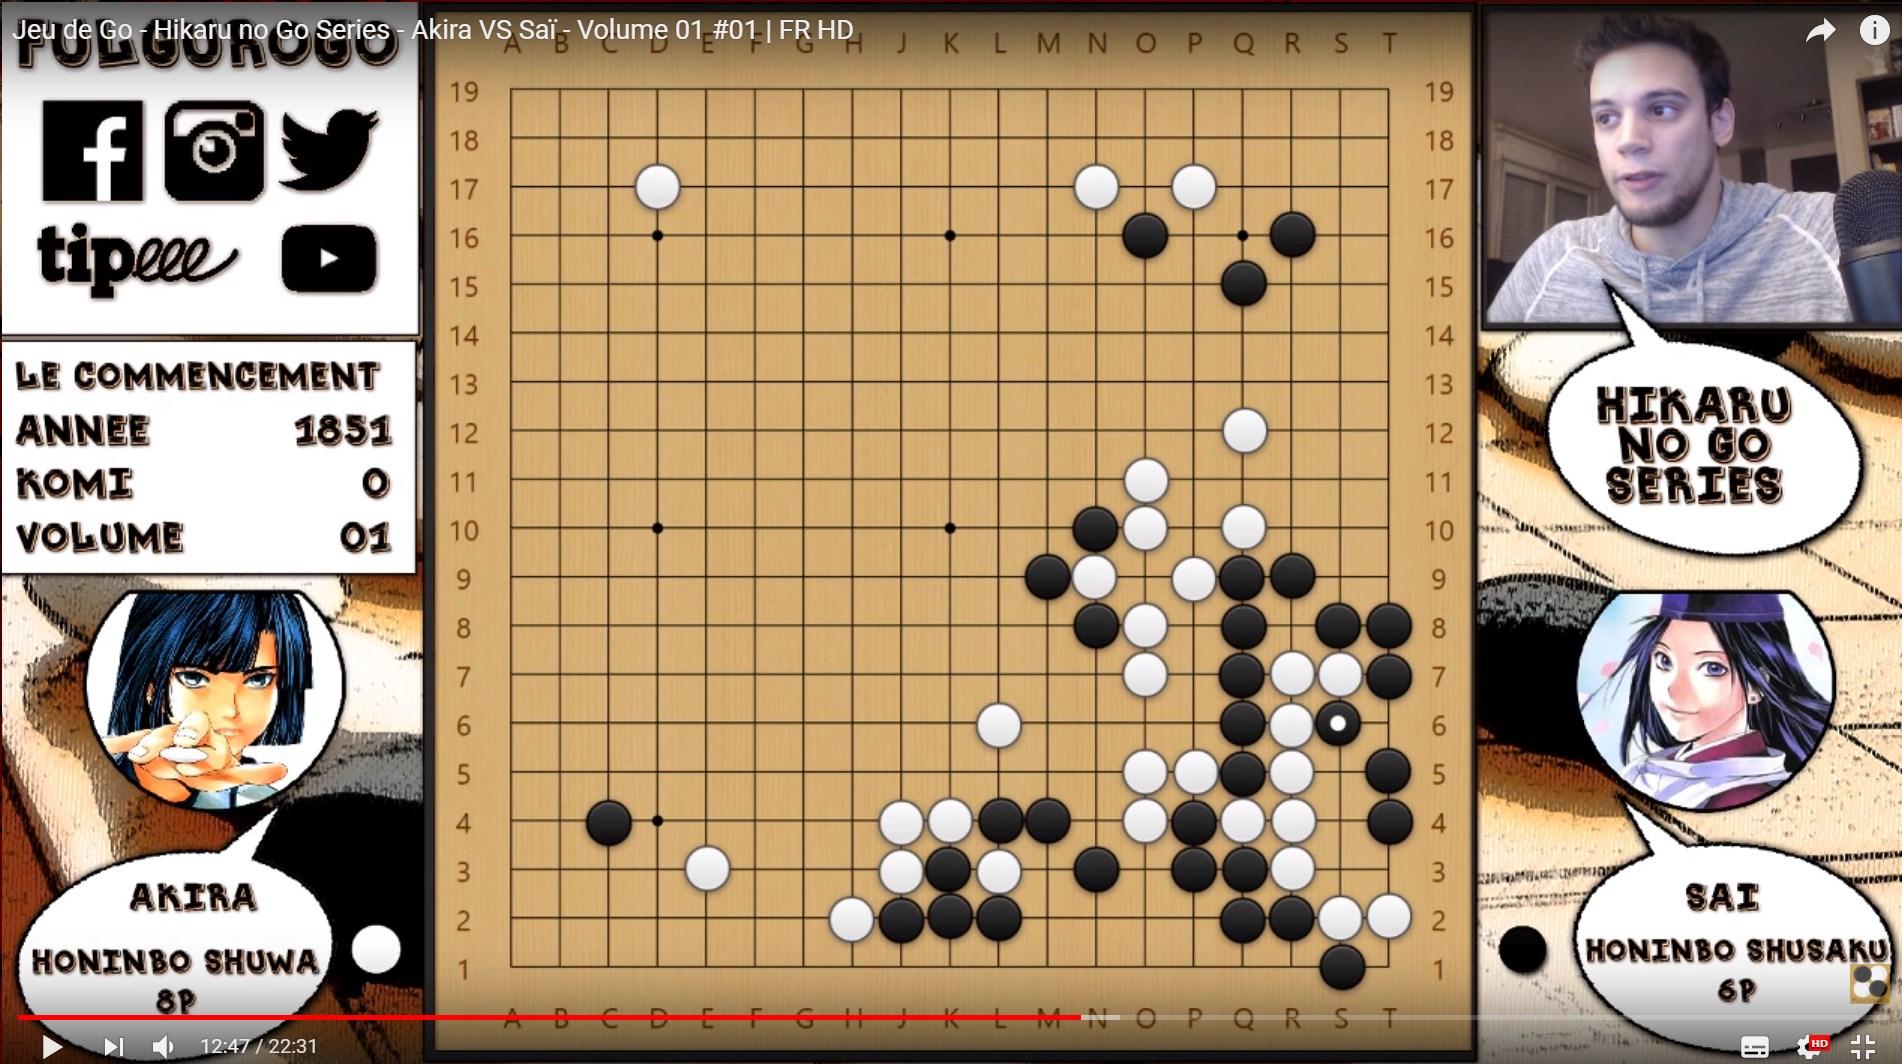 Hikaru no Go game commentaries